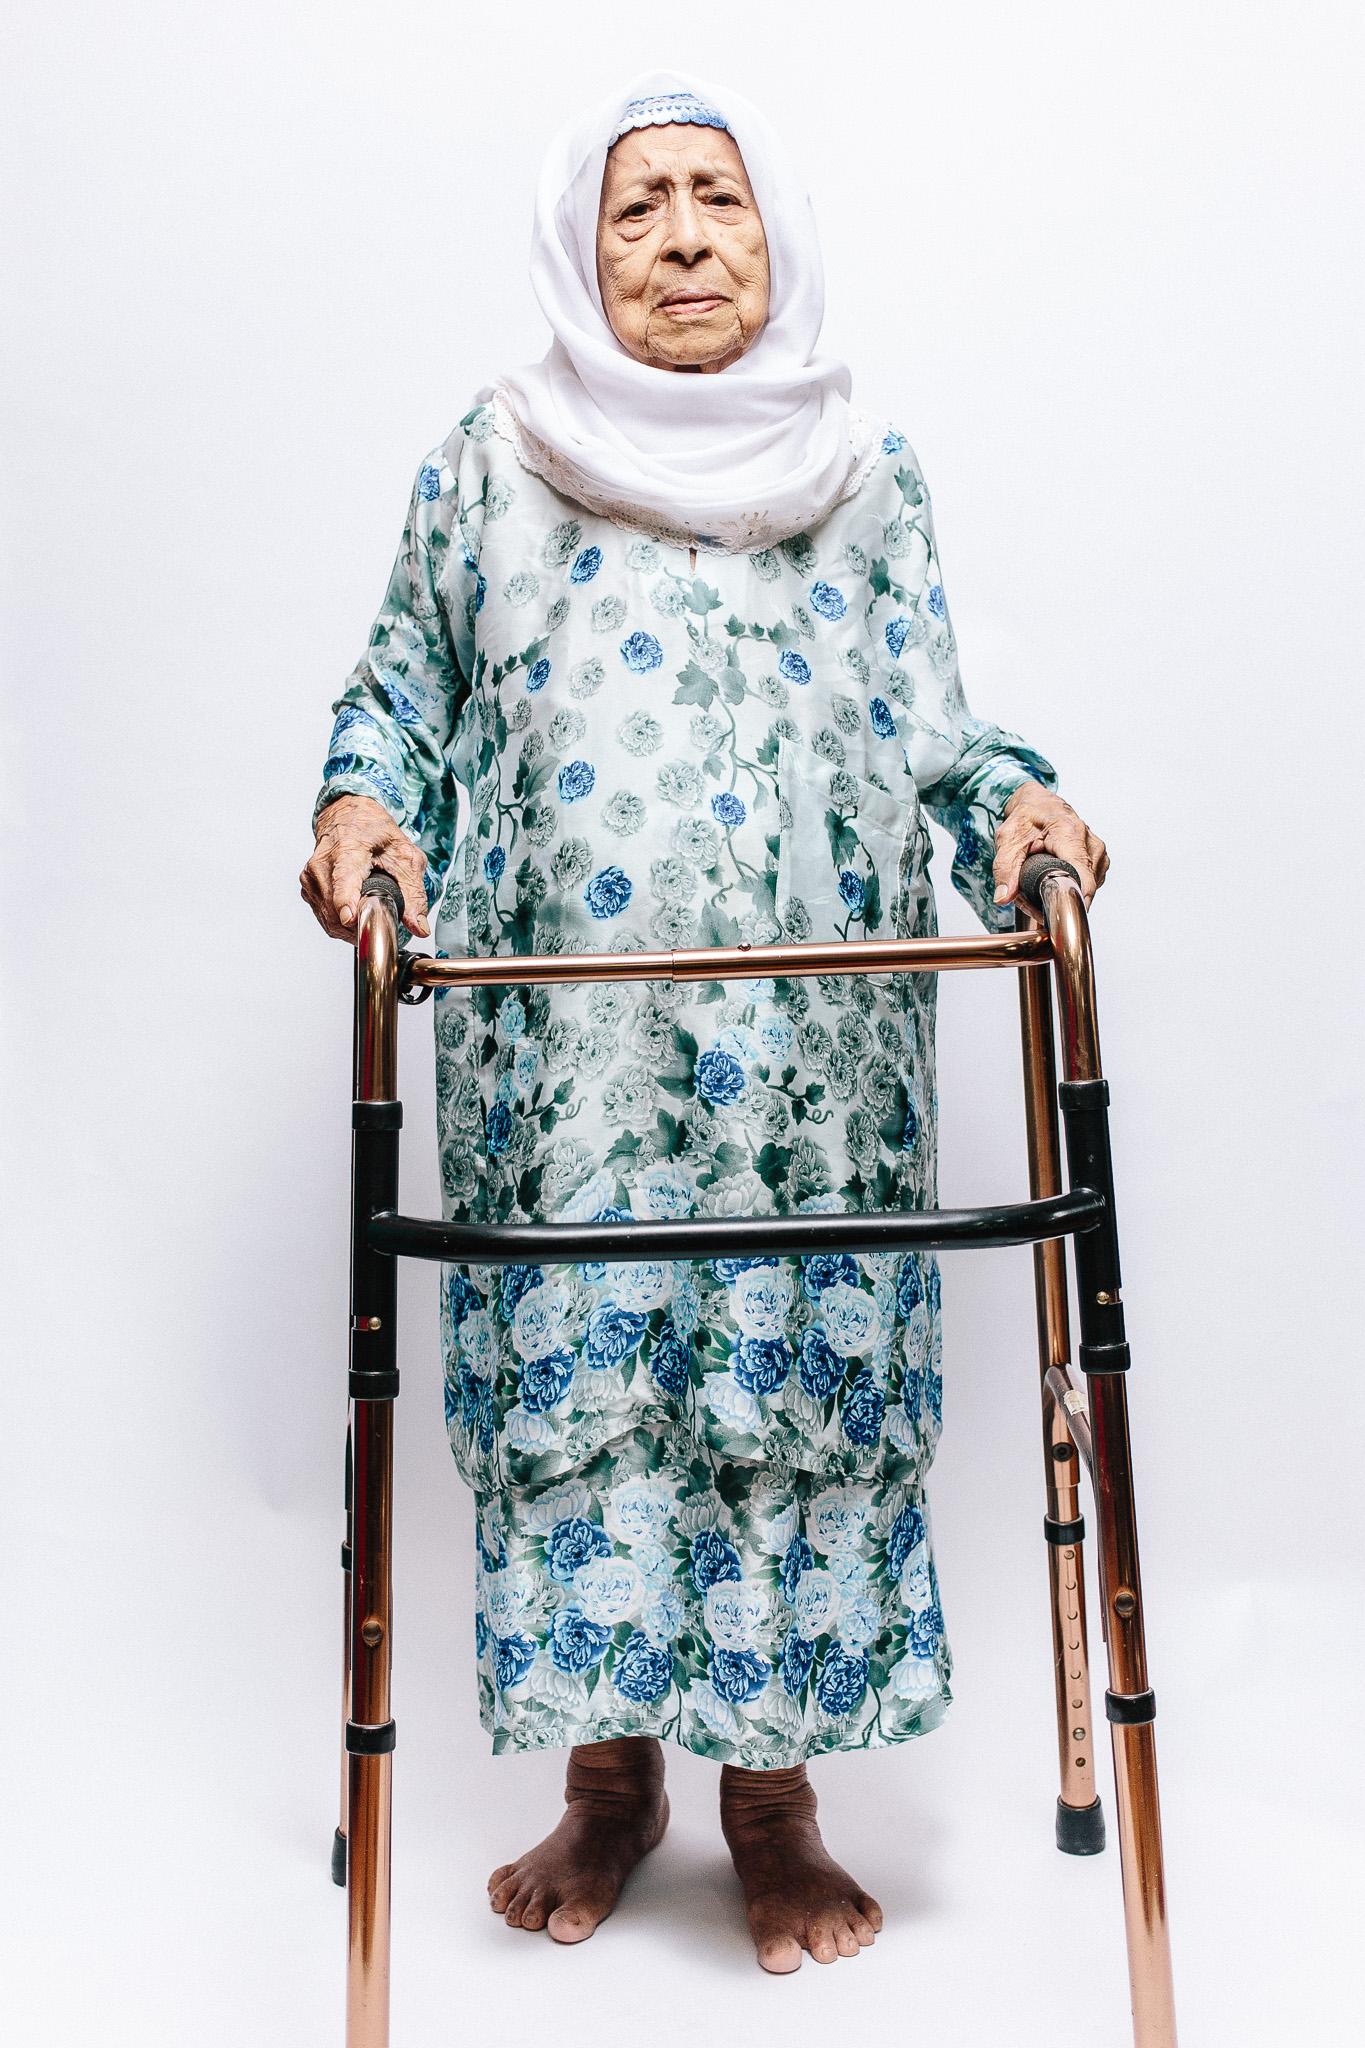 zainal-zainal-studio-centenarians-care-duke-nus-singapore-photographer-02.jpg